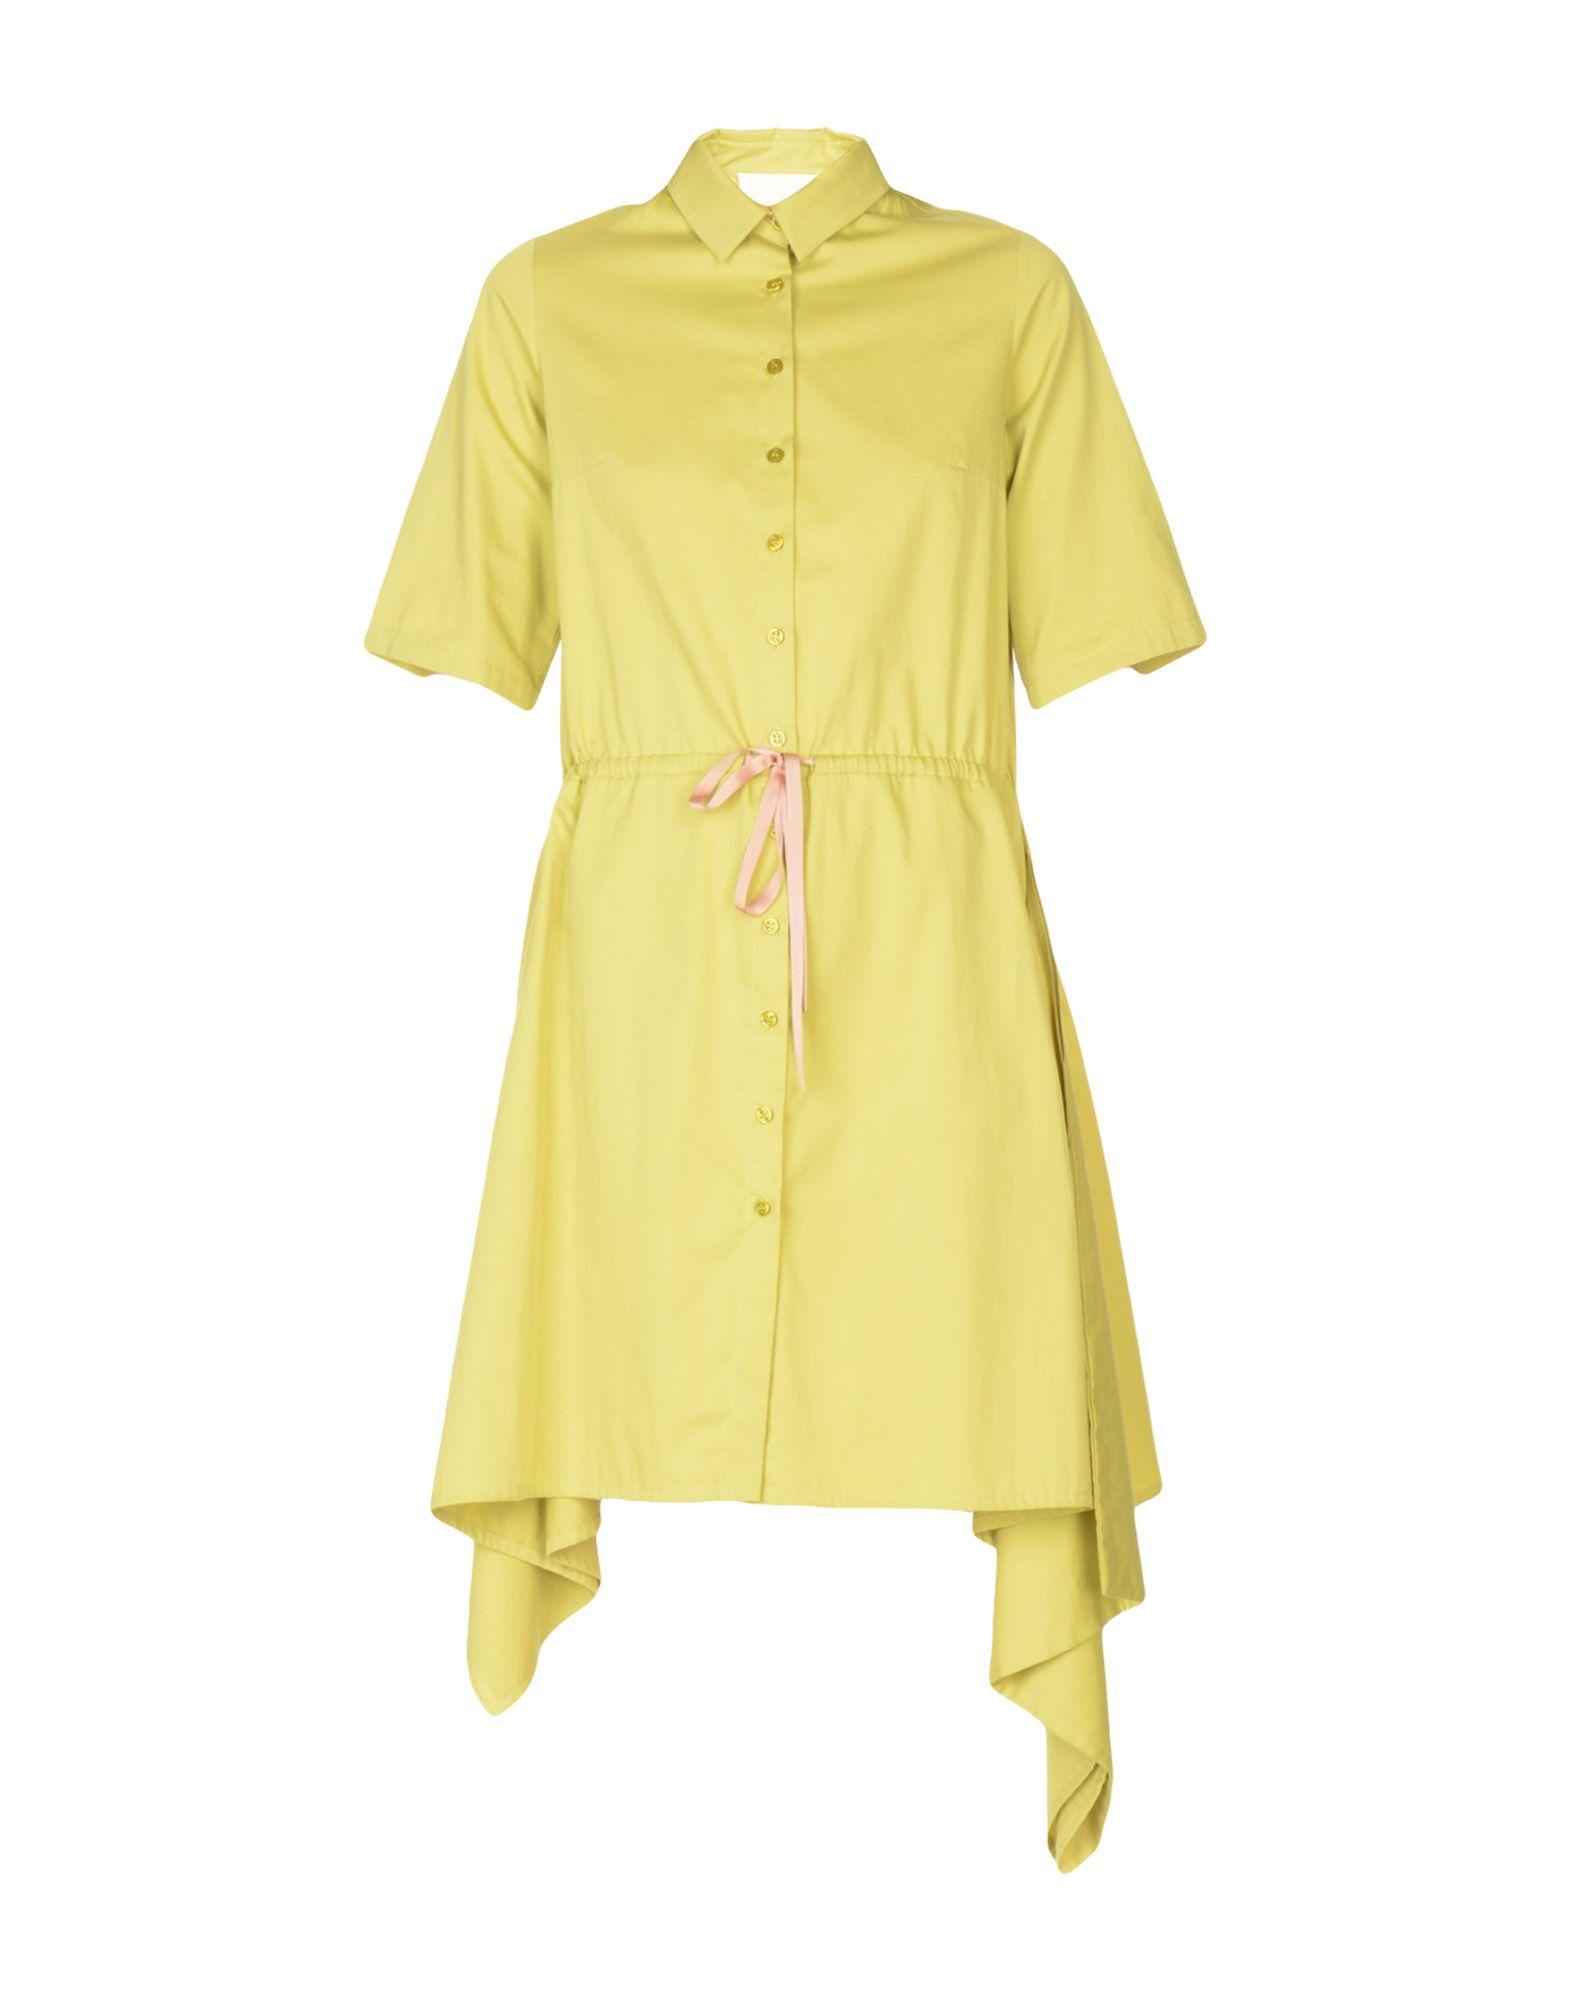 ELAIDI Shirt Dress in Acid Green